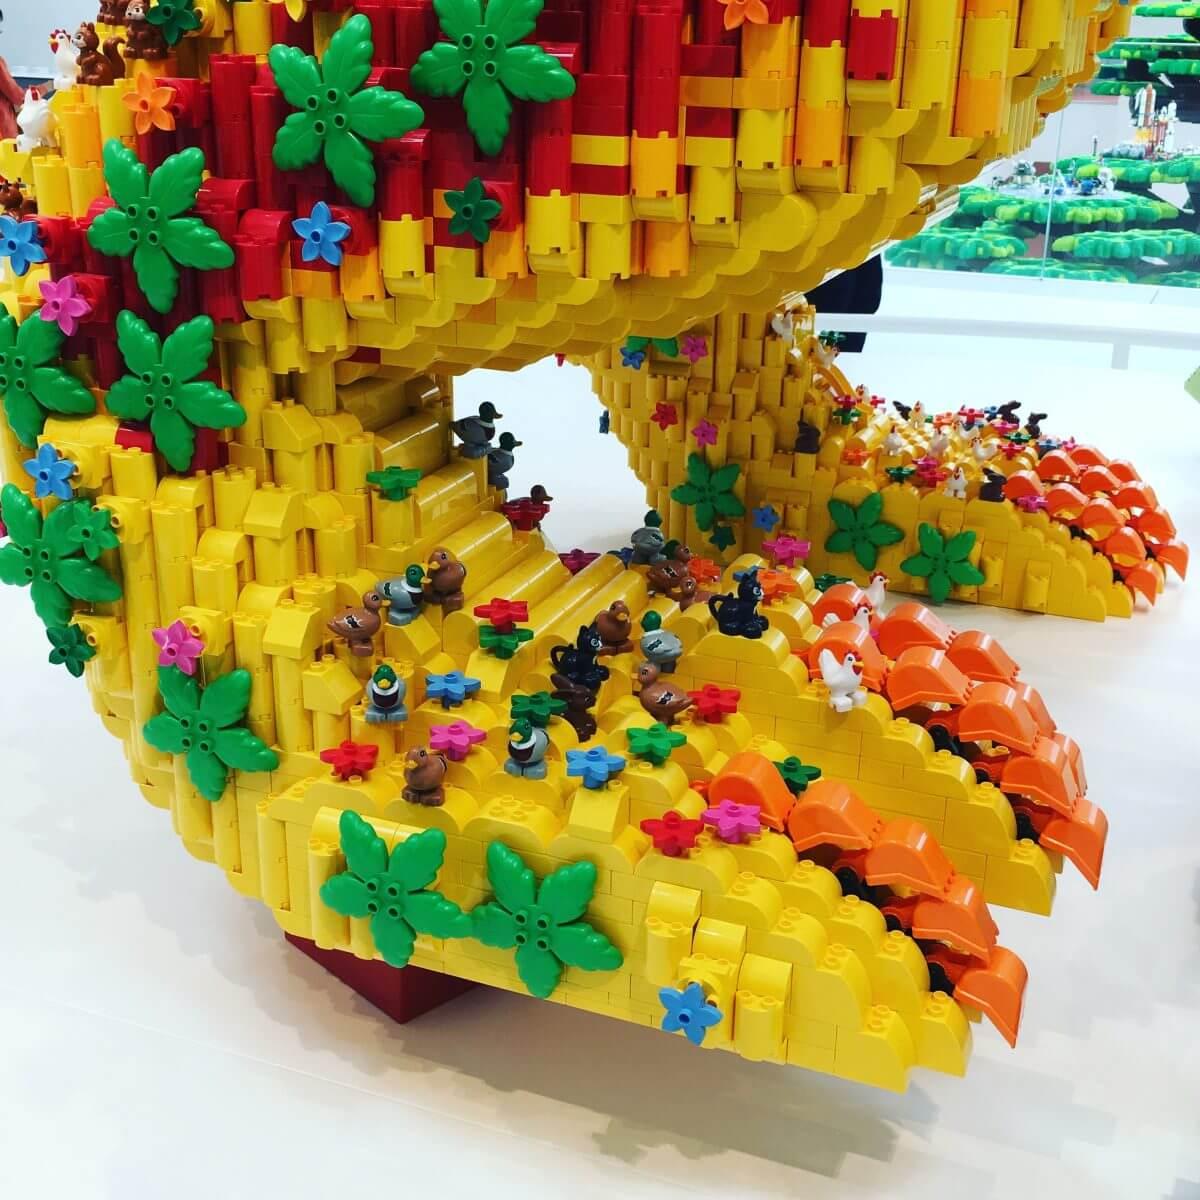 DUPLO draak in LEGO House vlakbij Legoland Billund